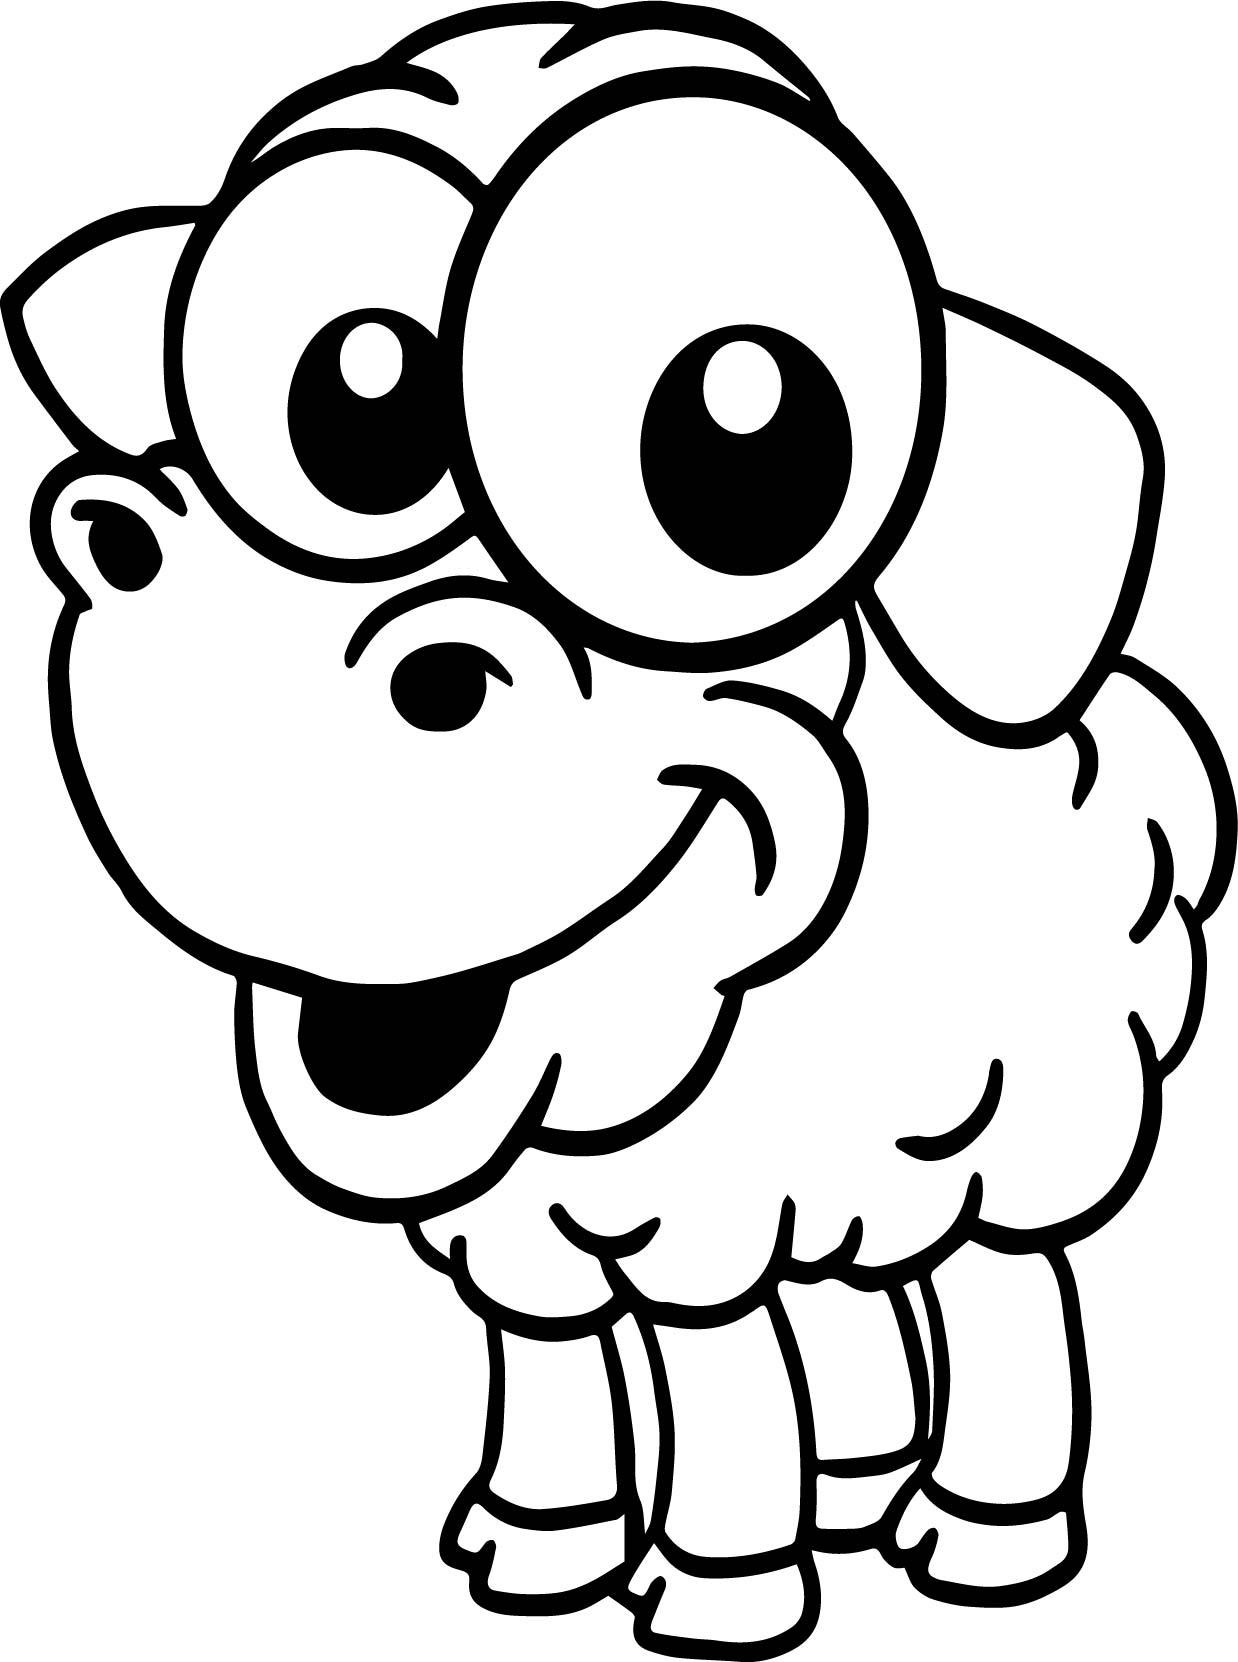 Baby Farm Sheep Animal Cartoon Coloring Page | Wecoloringpage